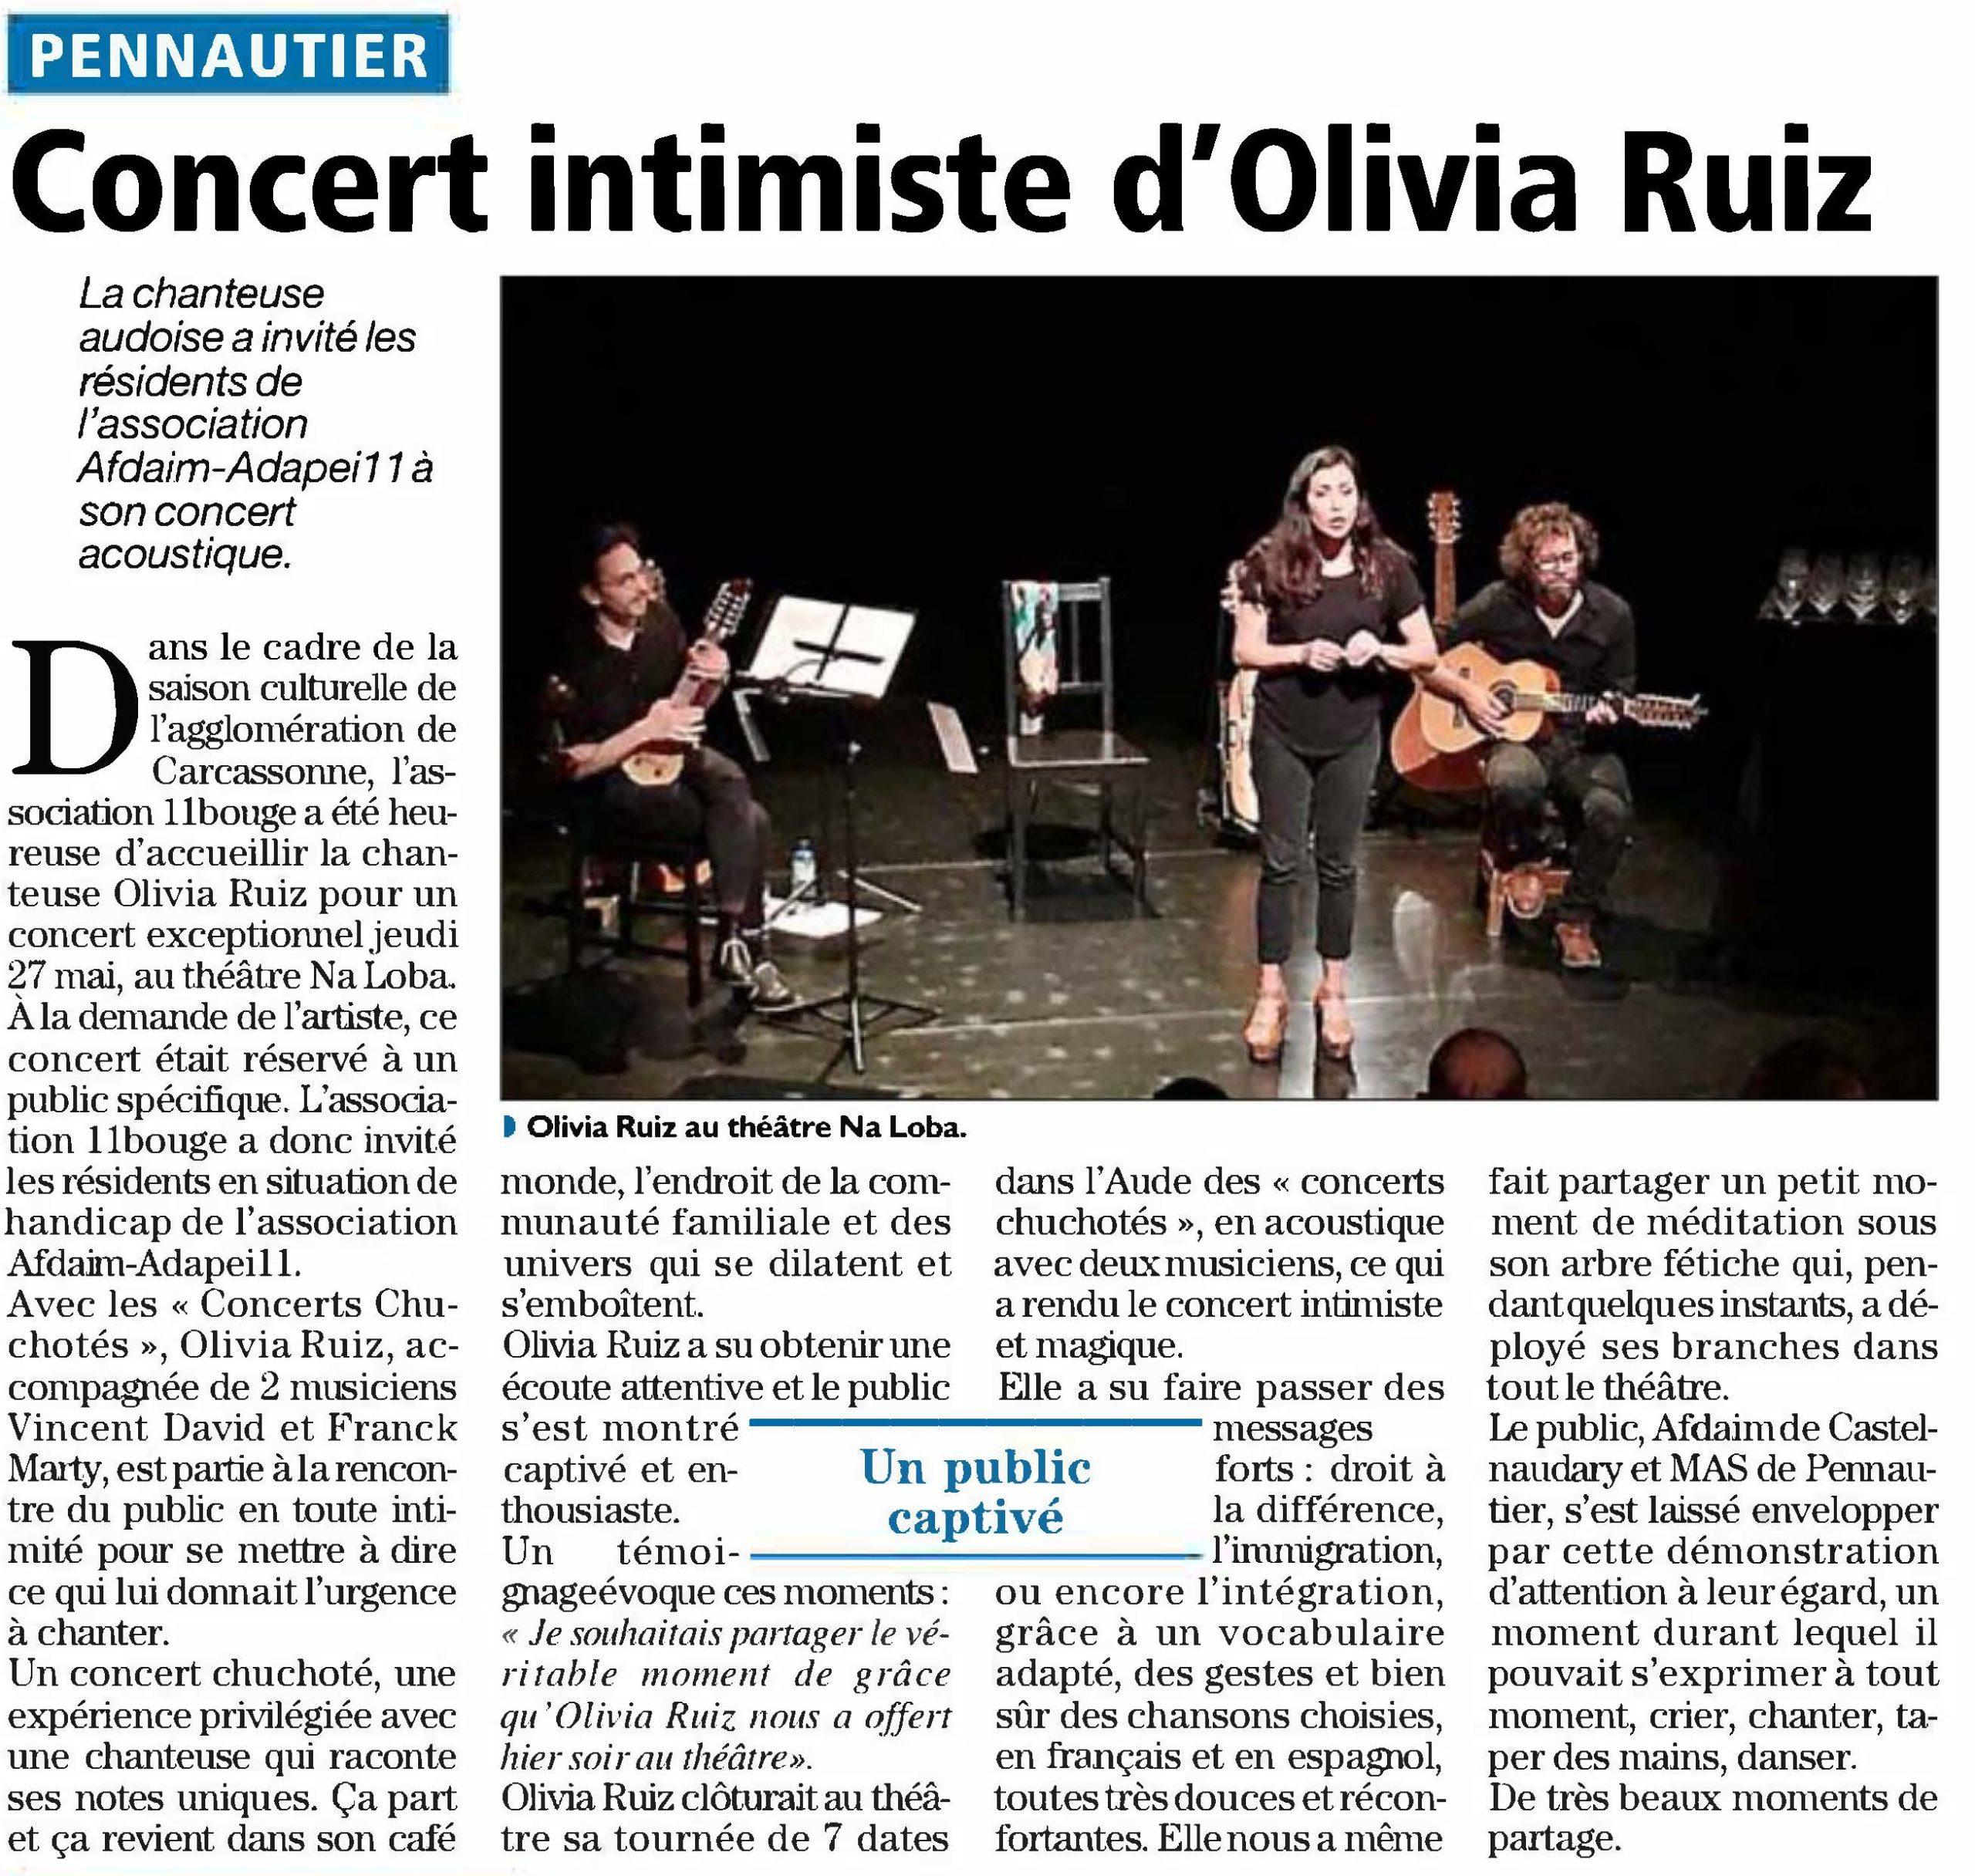 Concert intimiste Olivia Ruiz